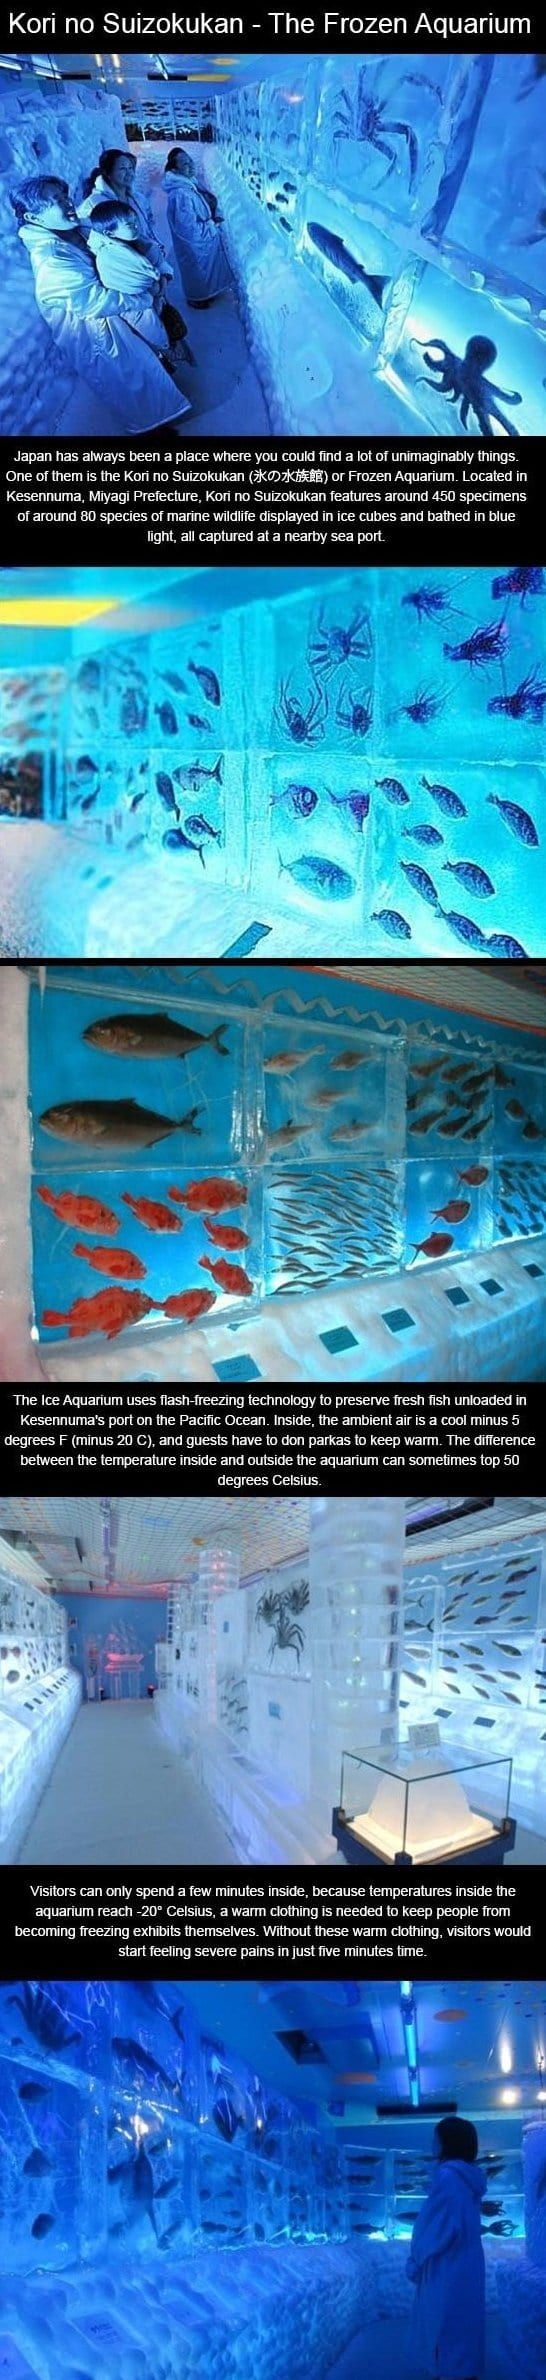 meme-2014-kori-no-suizokukan-the-frozen-aquarium